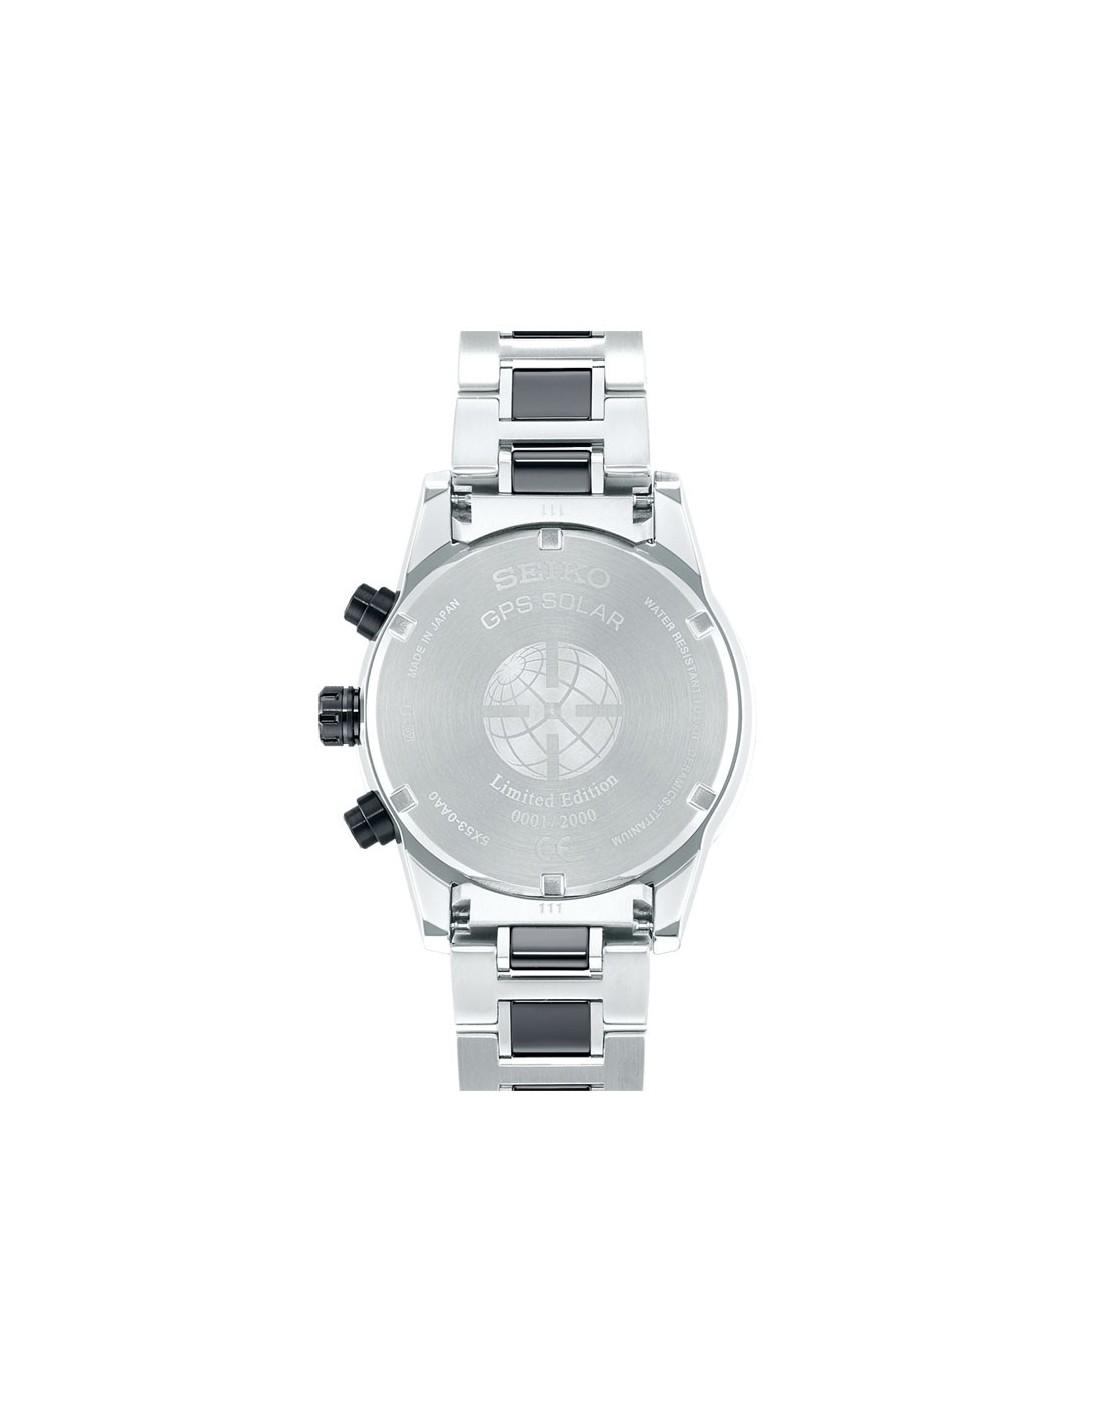 3c2ddc2826a6 ... Reloj SSH007J1 Seiko Astron GPS Solar Titanium Limited Edition